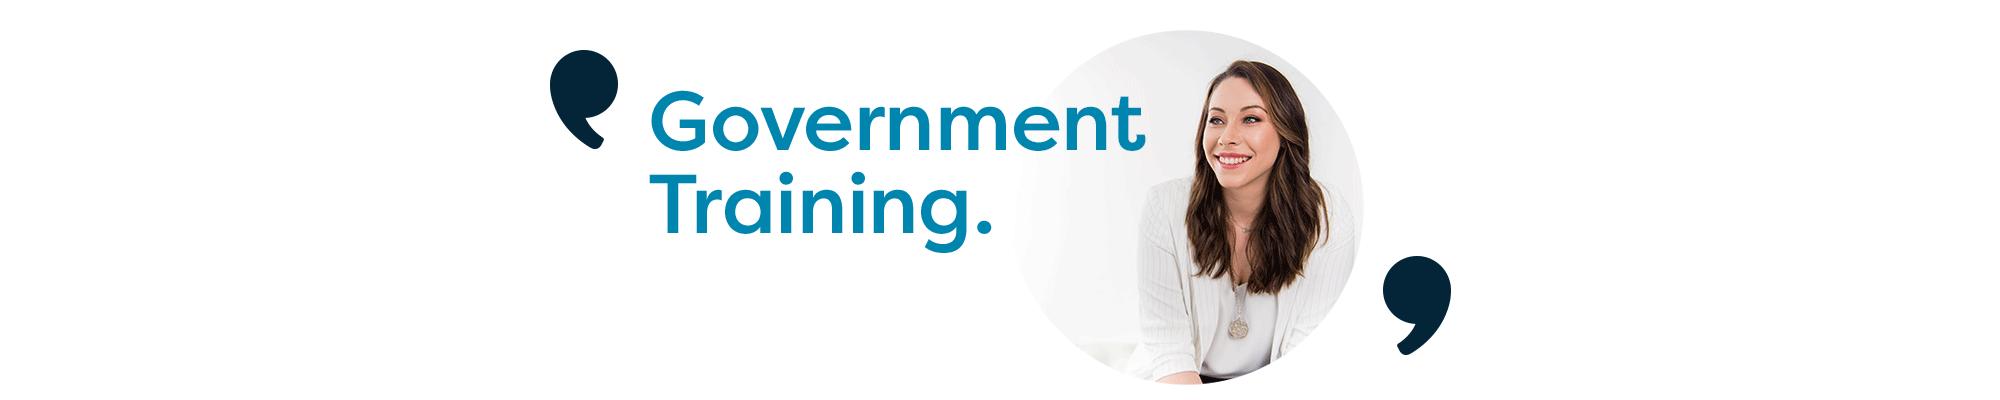 government-social-media-training